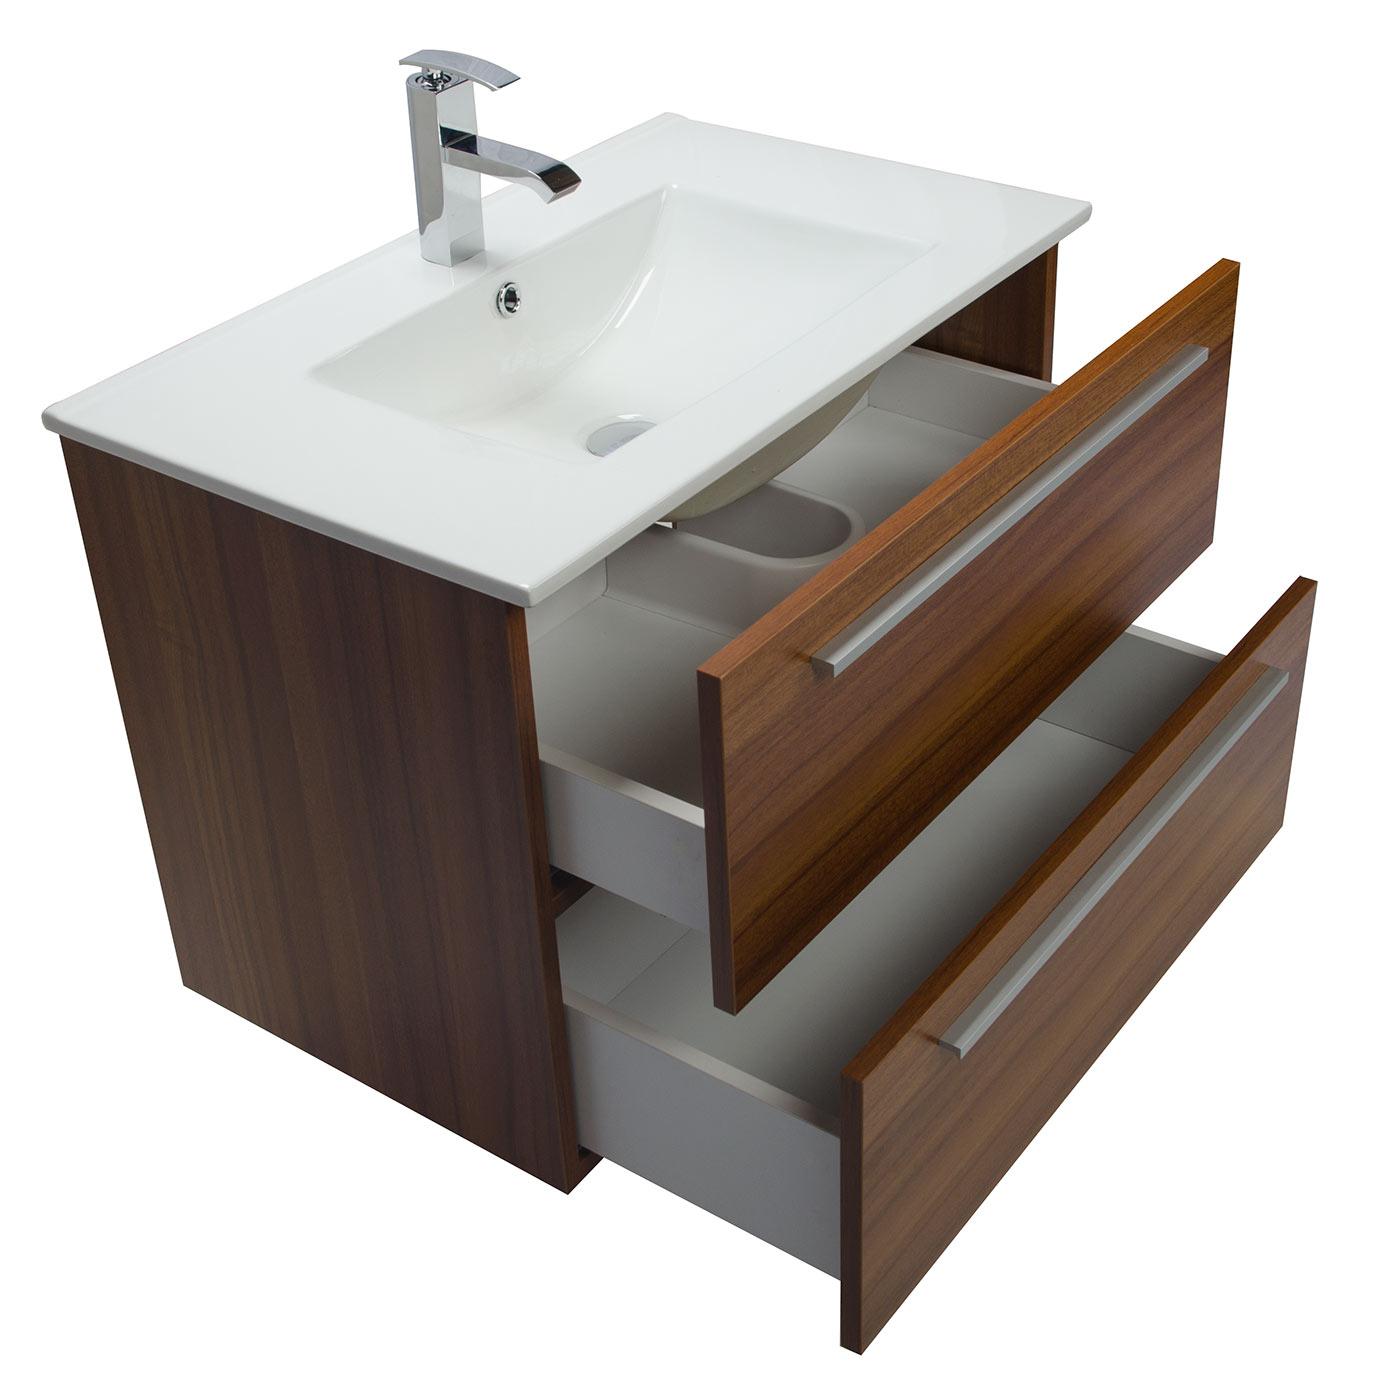 Teak bathroom vanity - Nola 29 5 Wall Mount Modern Bathroom Vanity Teak Tn T750c Tk